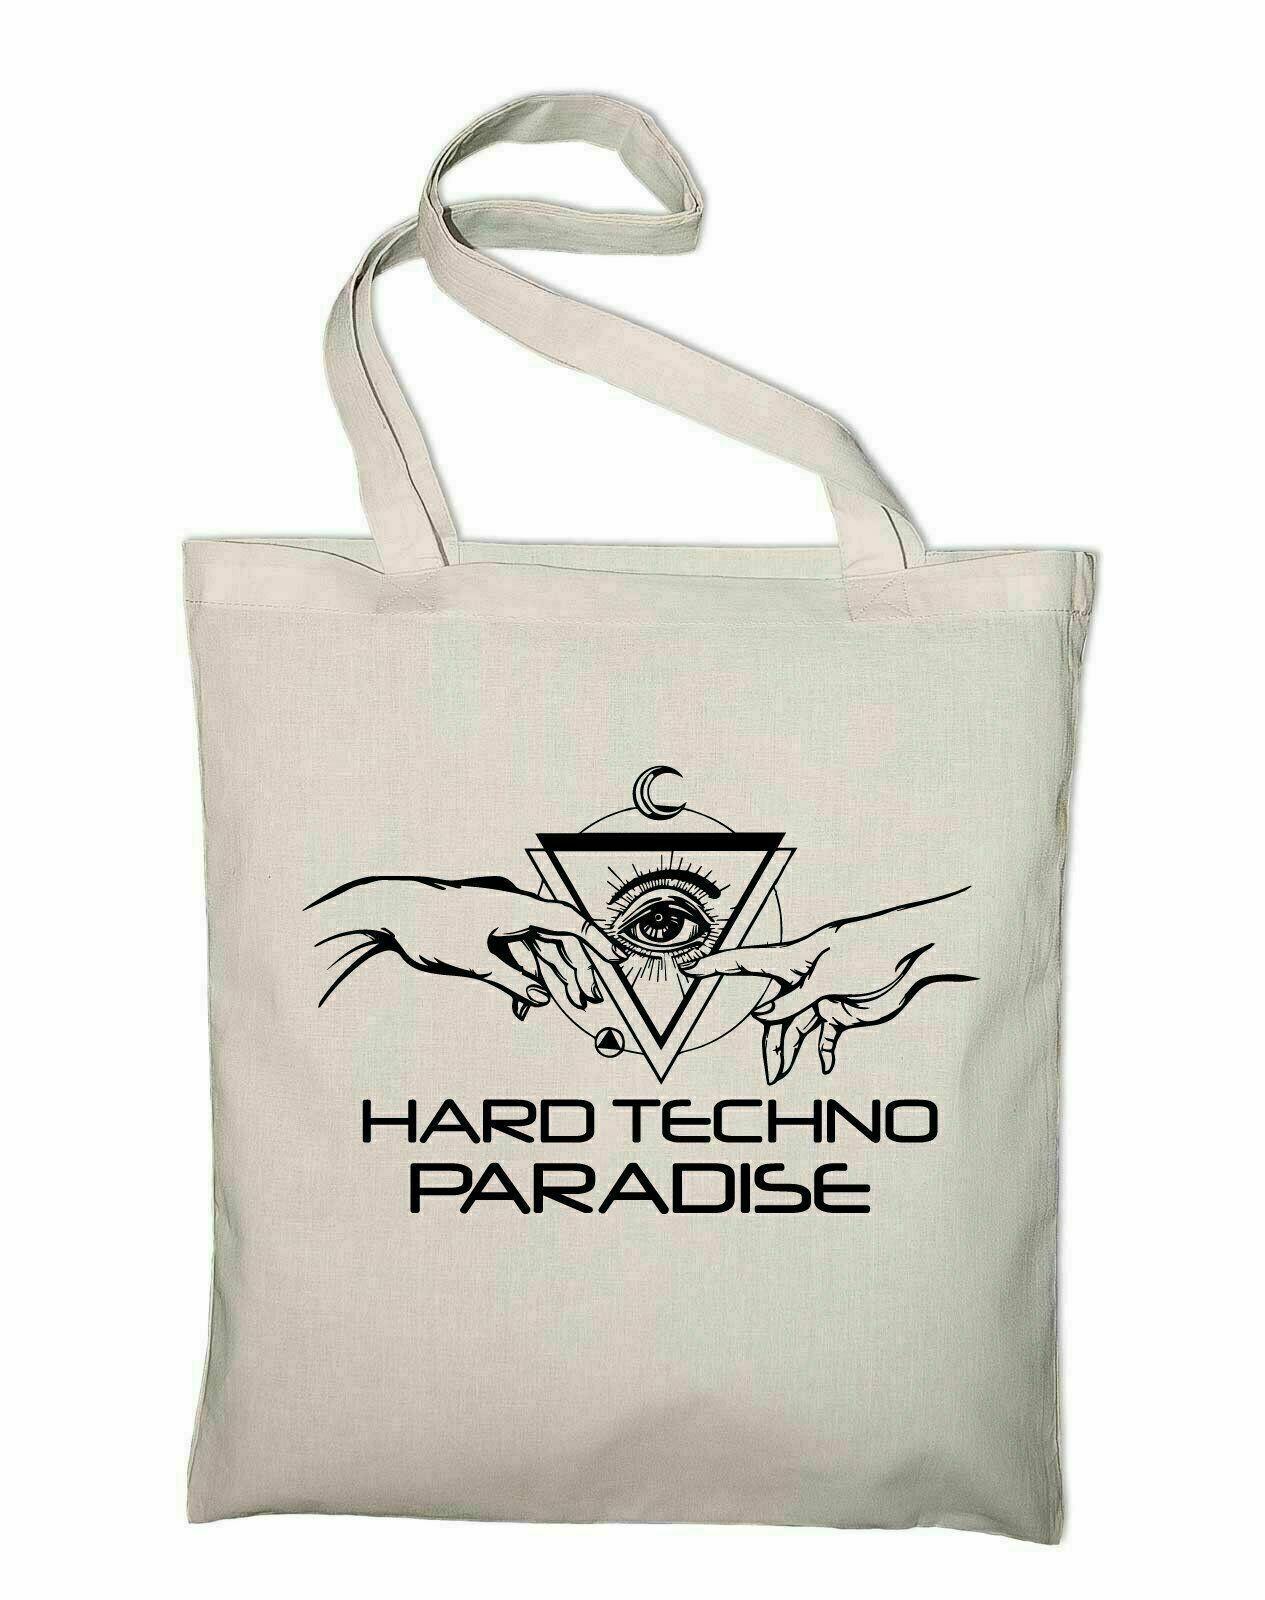 Hard Techno Paradise Jute Bags Genesis Schranz DJ RAVE house hardcore Bags